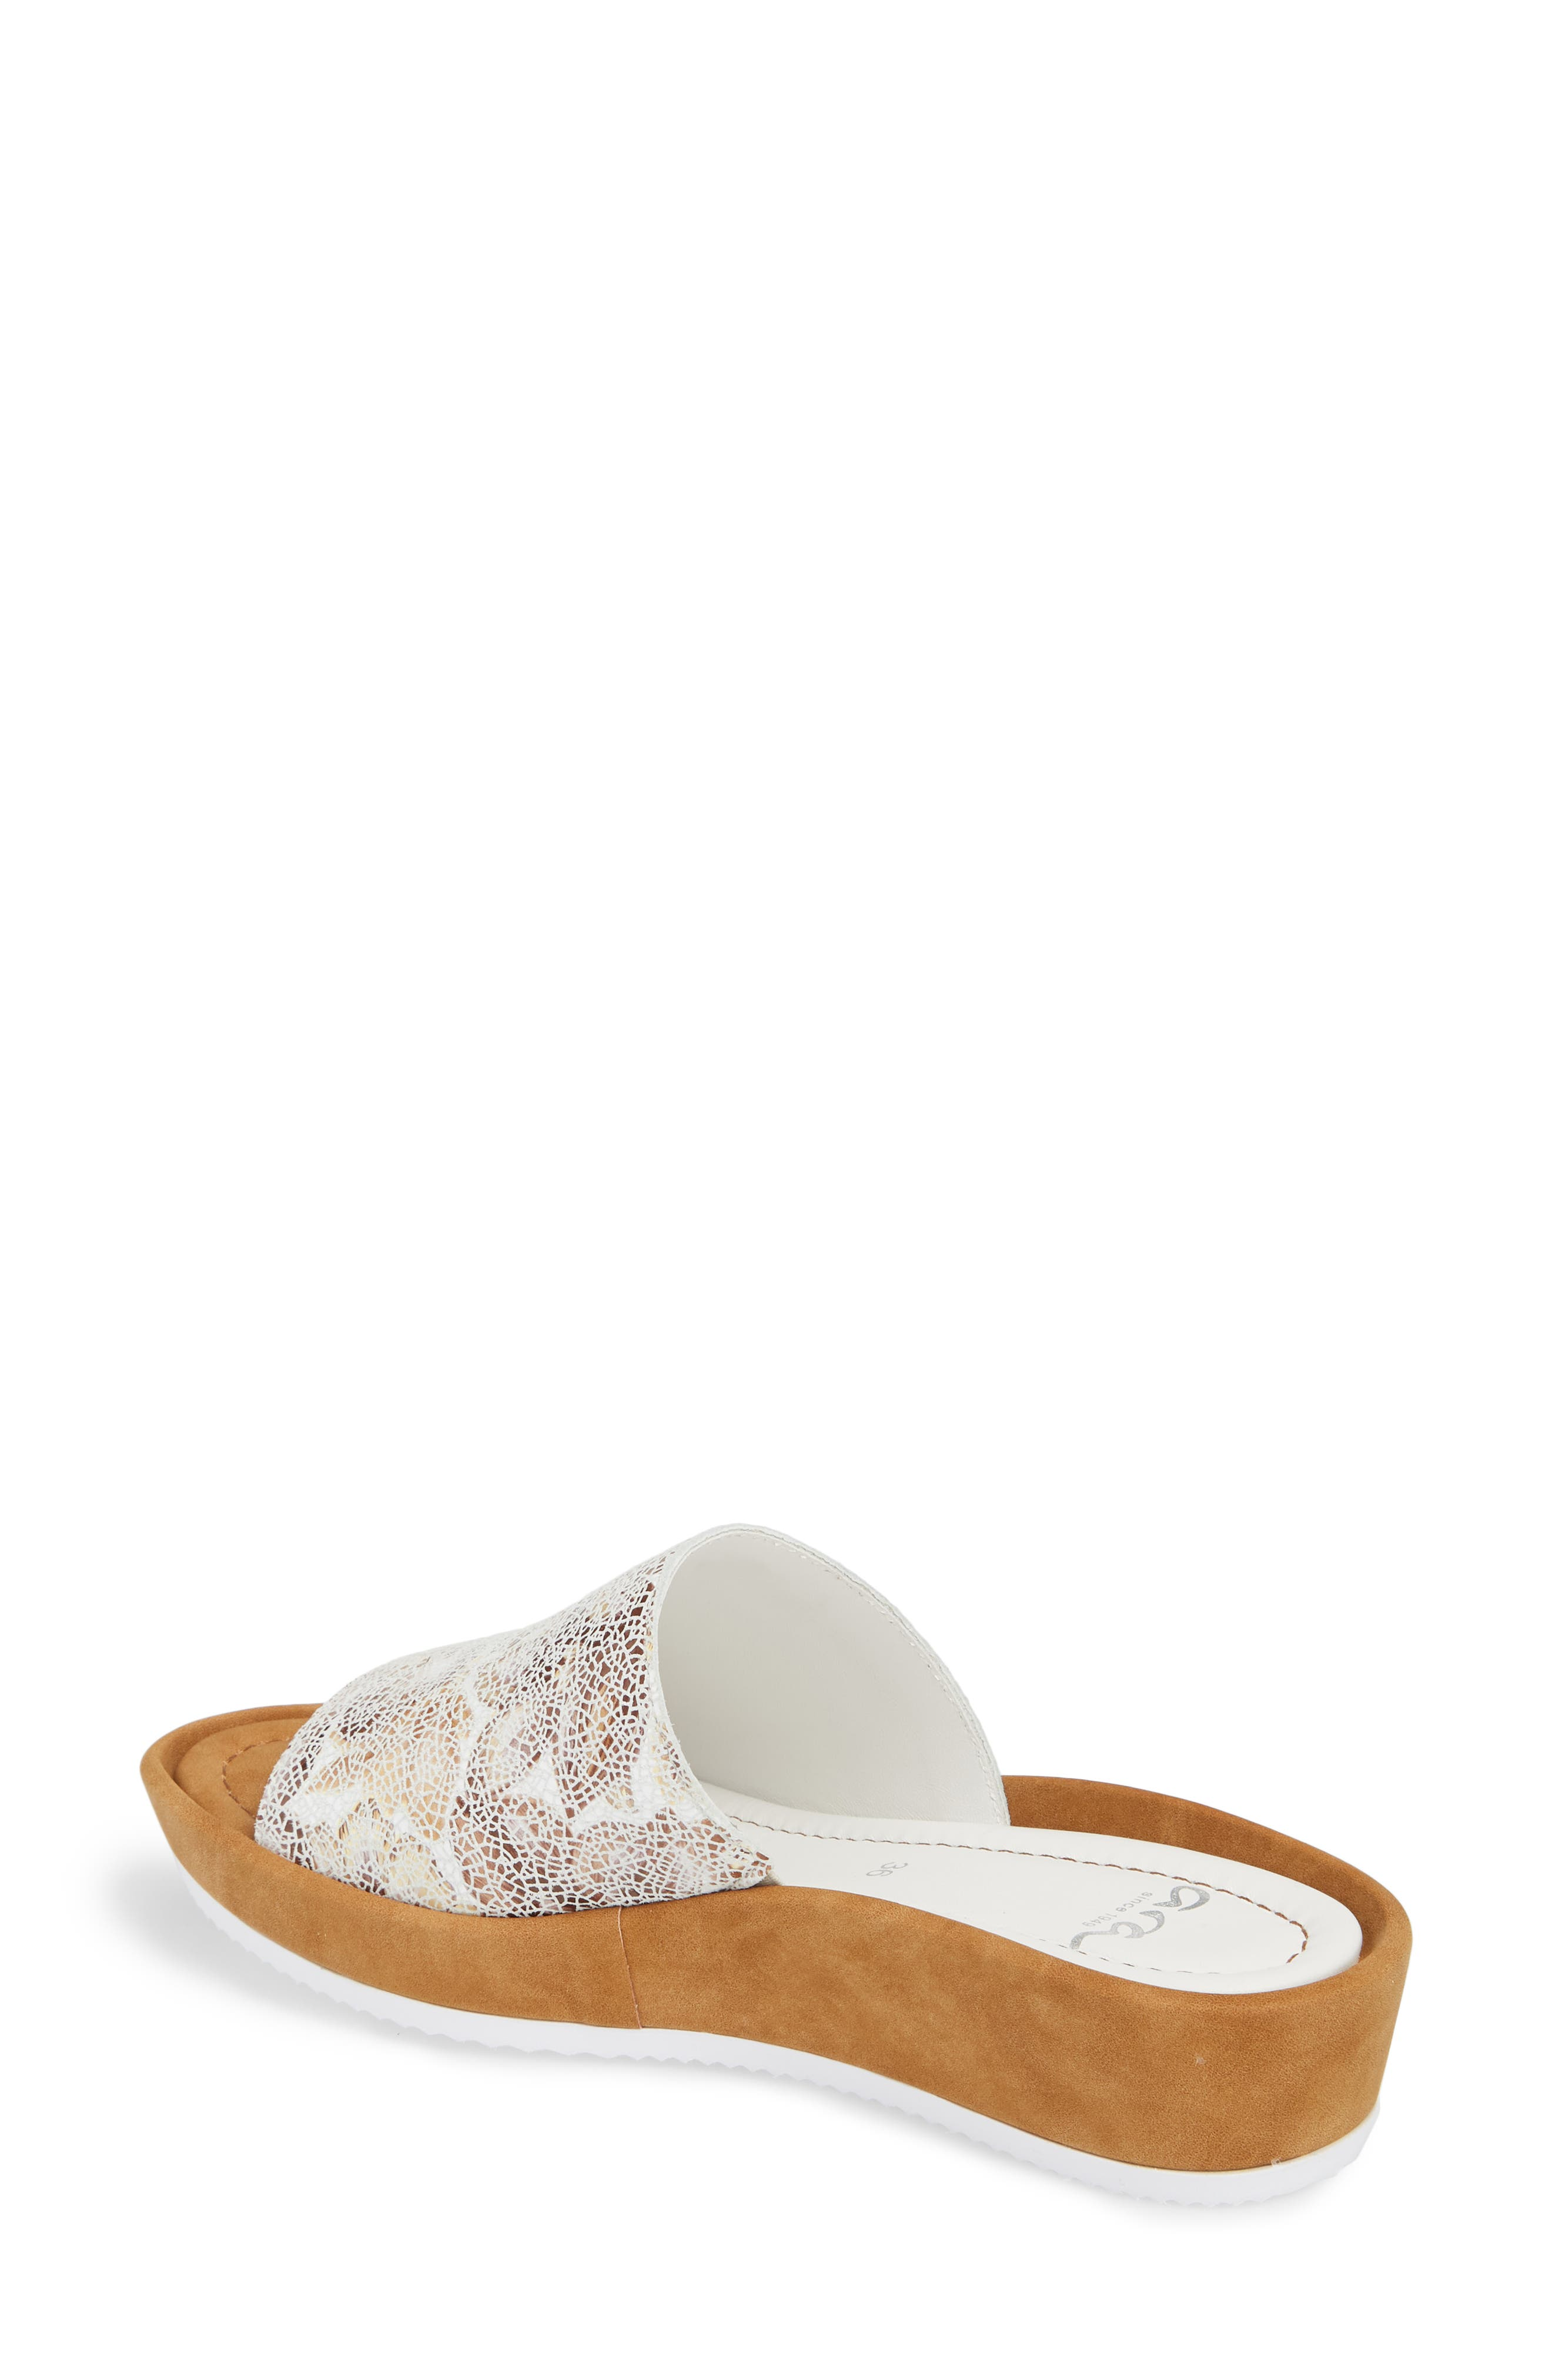 Tania Platform Wedge Slide Sandal,                             Alternate thumbnail 2, color,                             Taupe Leather